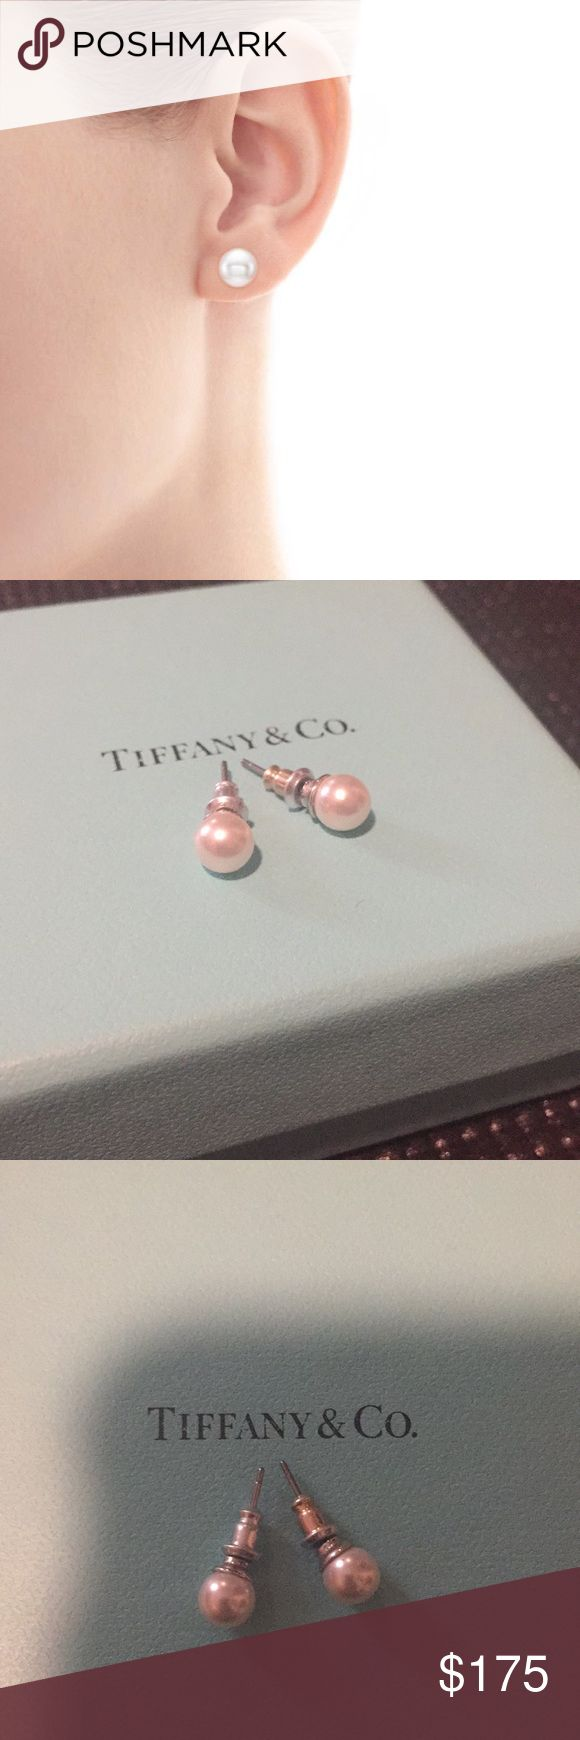 Tiffany pearl earrings Beautiful, elegant, and classic freshwater pearl earrings from Tiffany & Co. Tiffany & Co. Jewelry Earrings